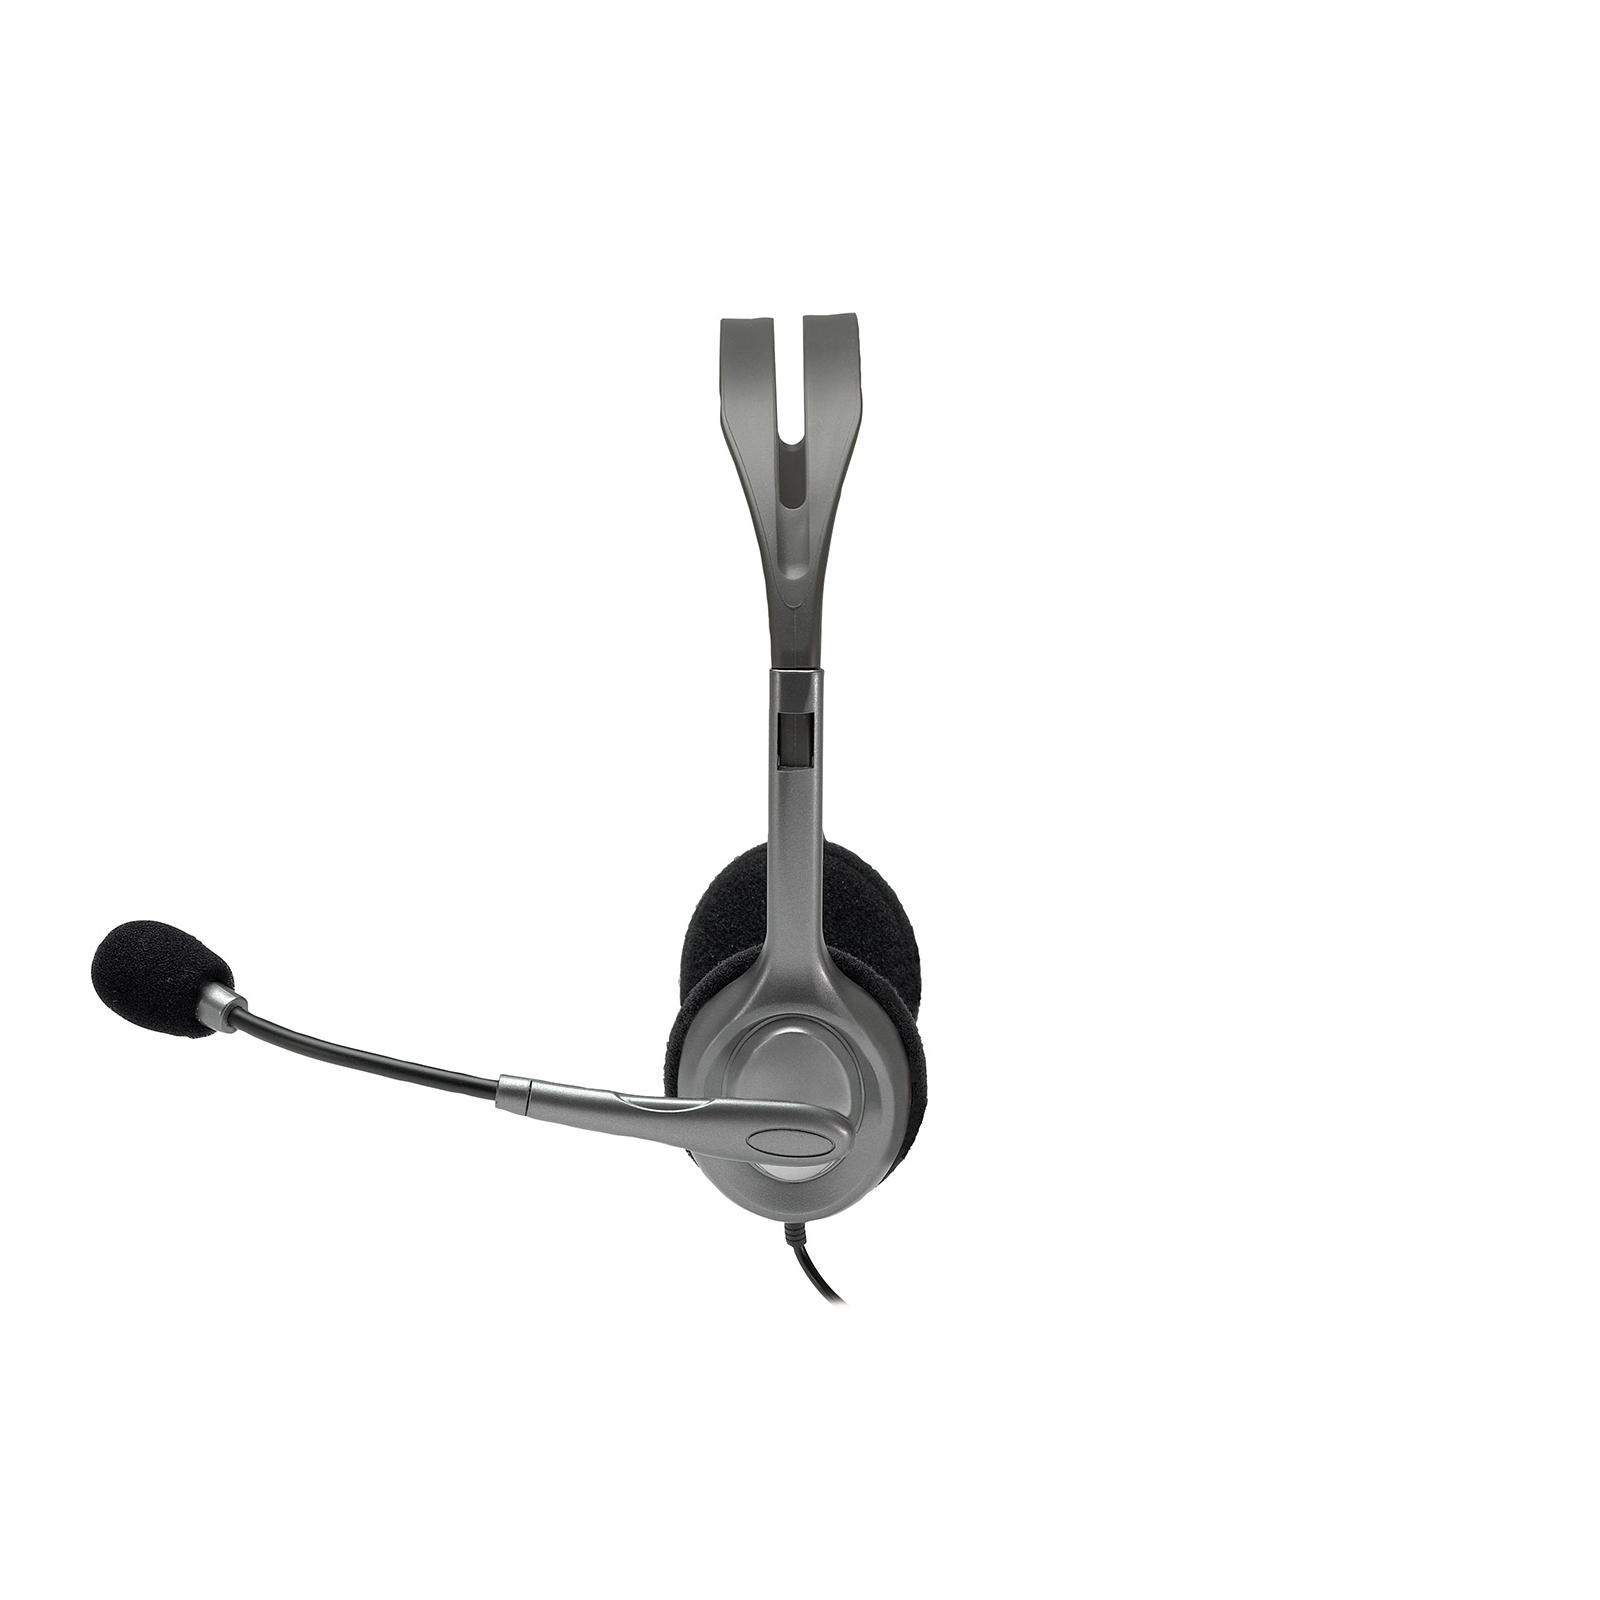 Наушники Logitech H111 Stereo Headset with 1*4pin jack (981-000593) изображение 2